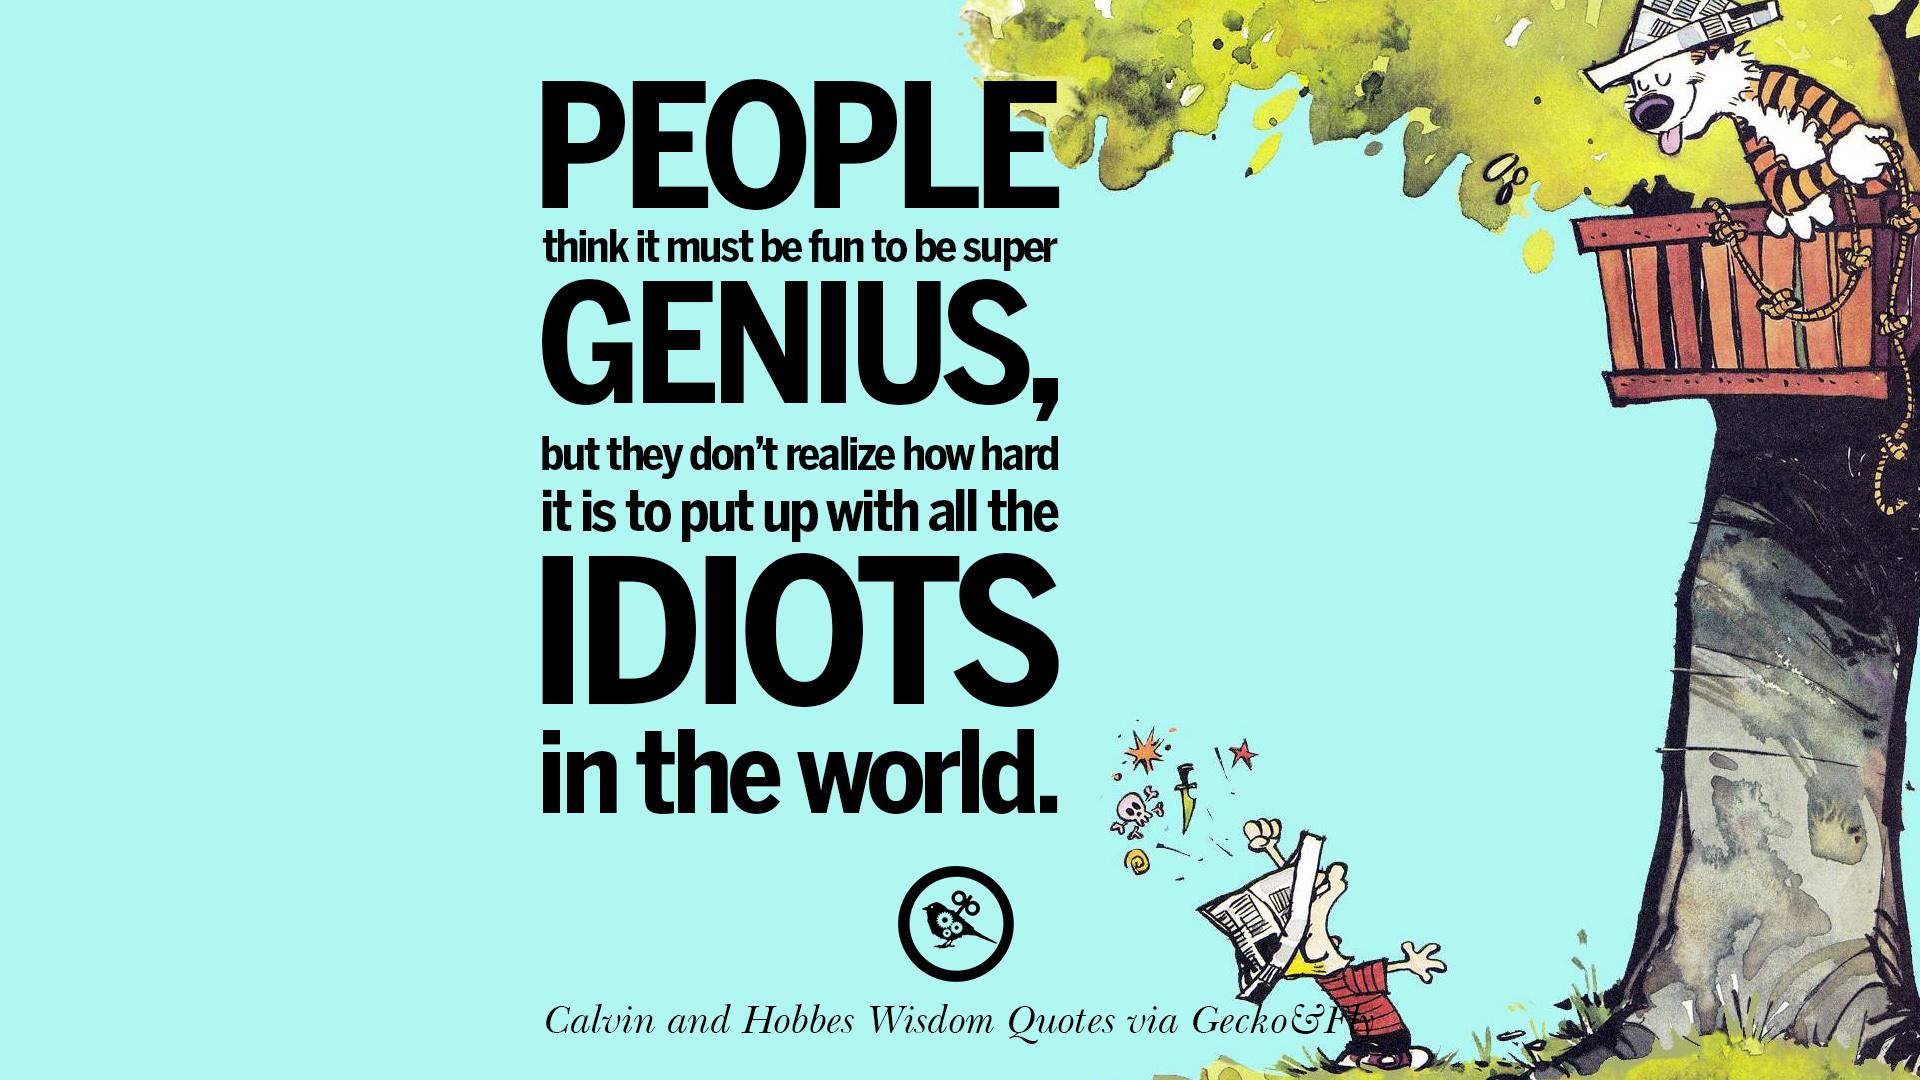 Popular Wallpaper Mac Calvin And Hobbes - calvin-hobbes-quotes-wisdom-08  You Should Have_846048.jpg